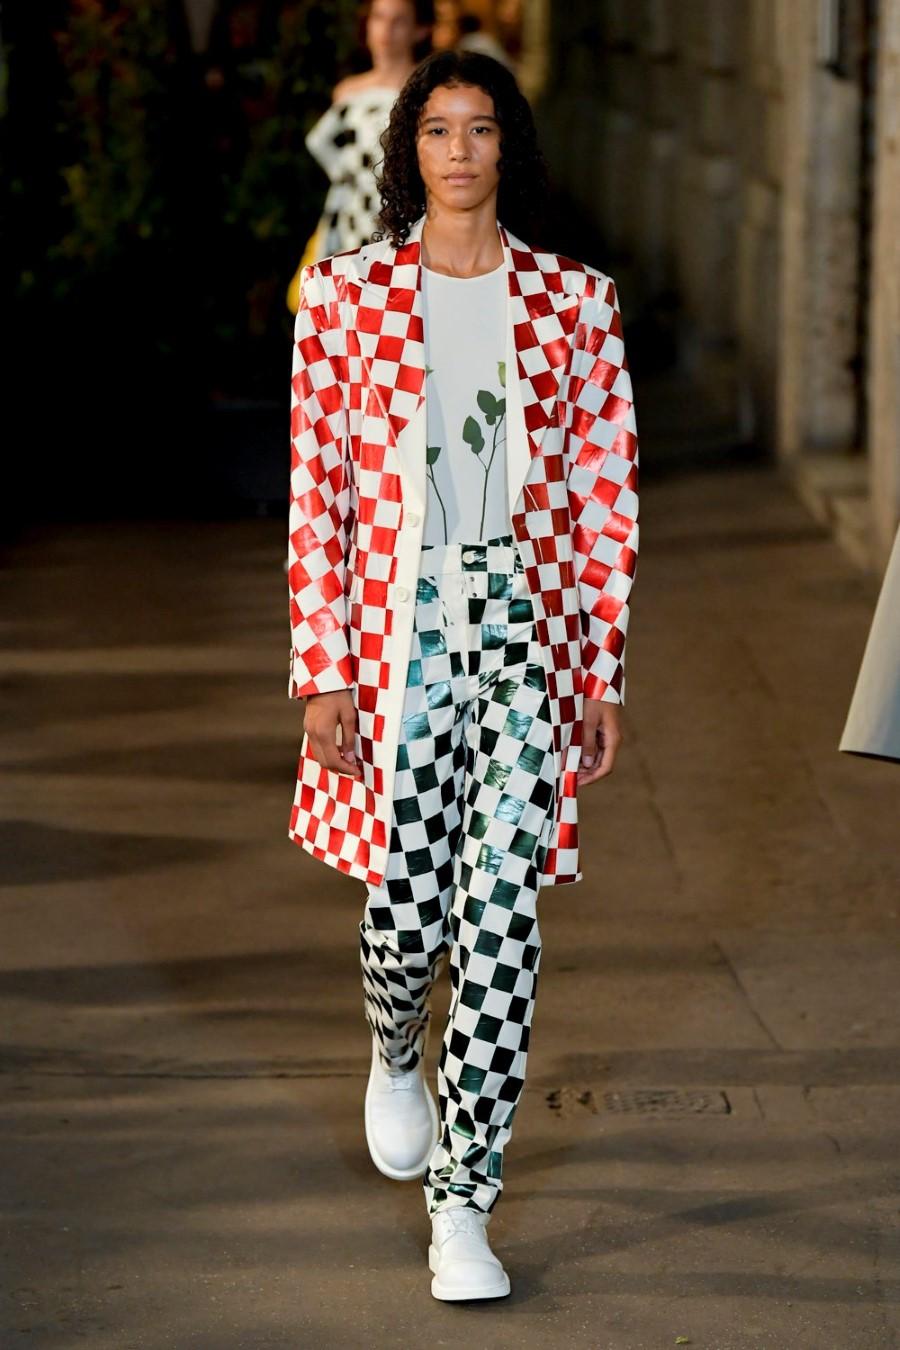 MM6 Maison Margiela Spring Summer 2022 - Milan Fashion Week